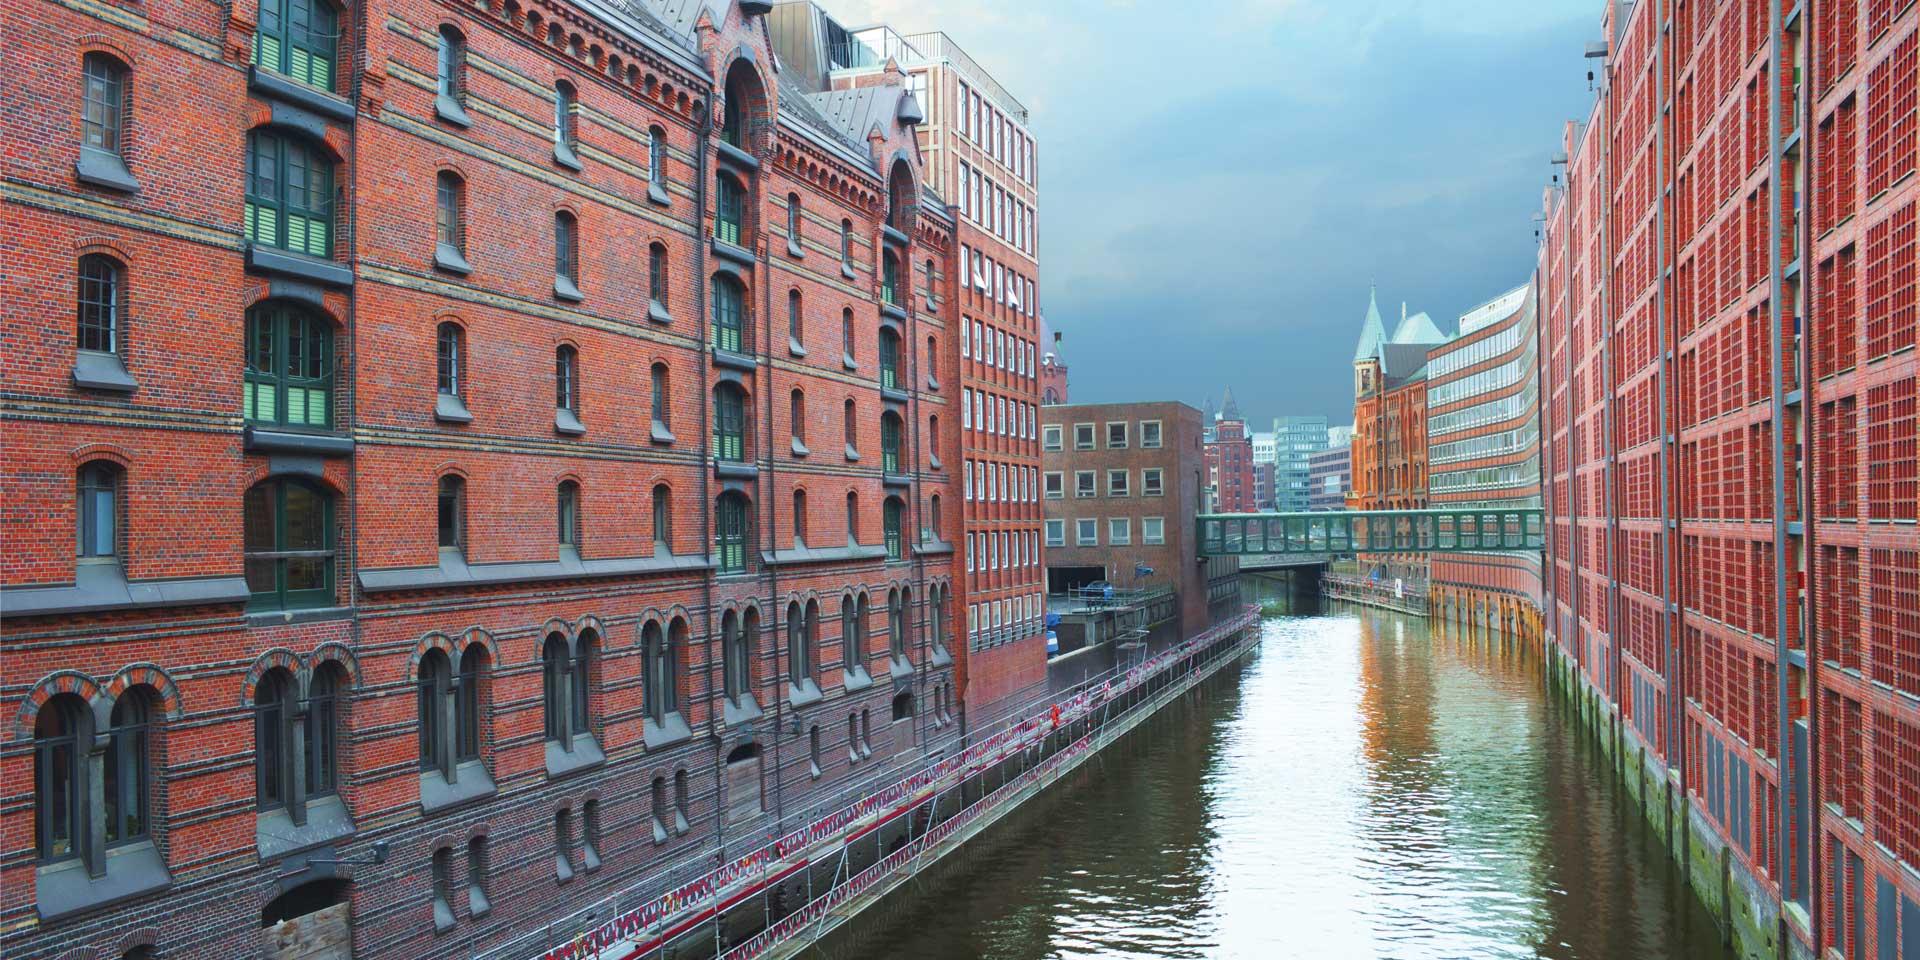 Google Wallpaper Hd Hamburg White Amp Case Llp International Law Firm Global